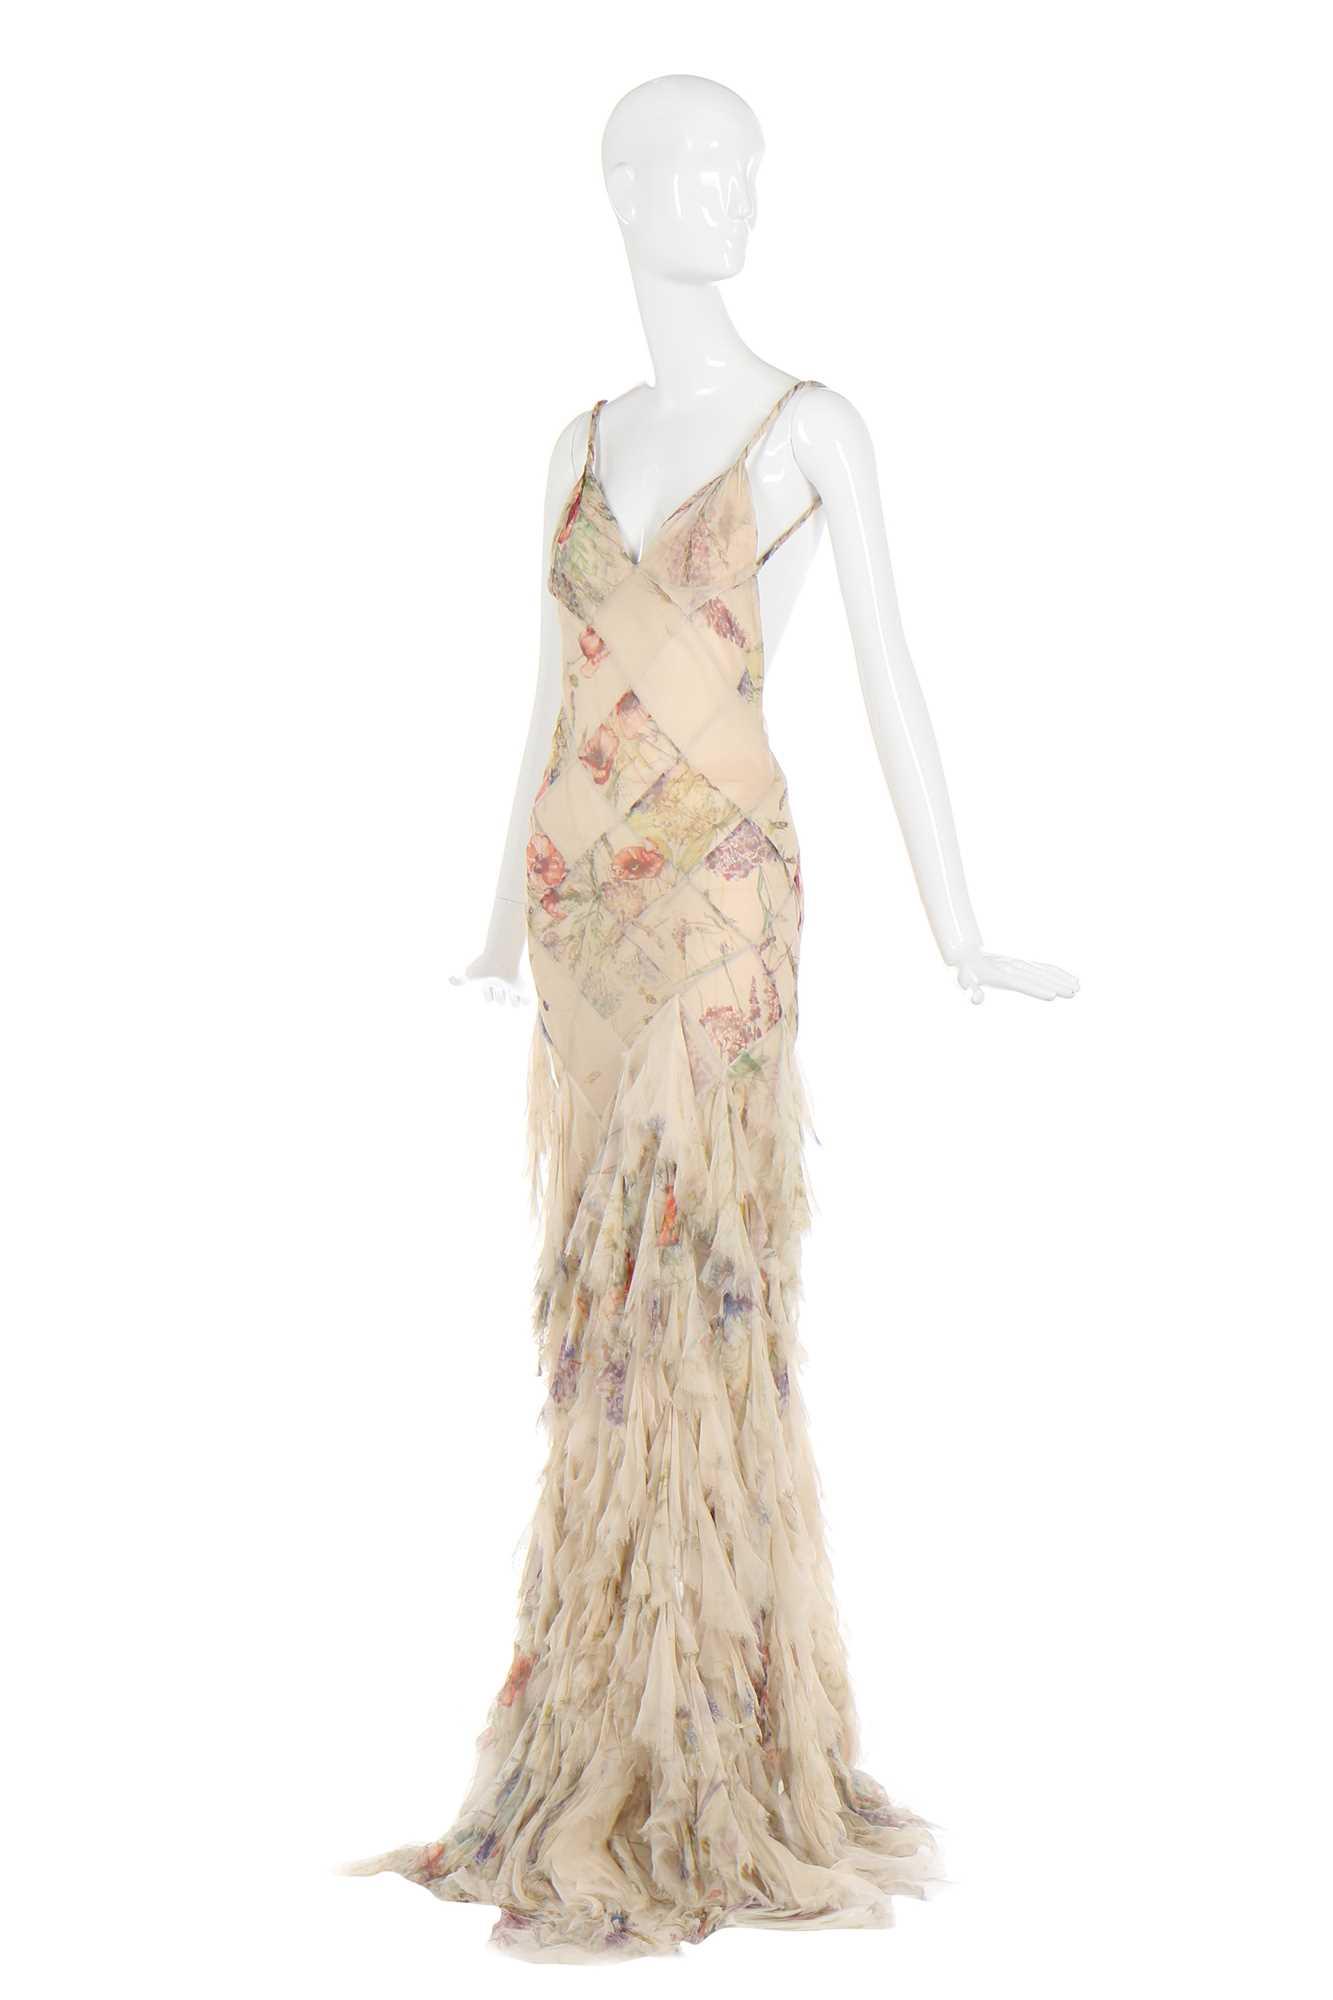 Lot 31-Alexander McQueen bias-cut floral chiffon dress, 'Deliverance', Spring-Summer 2004